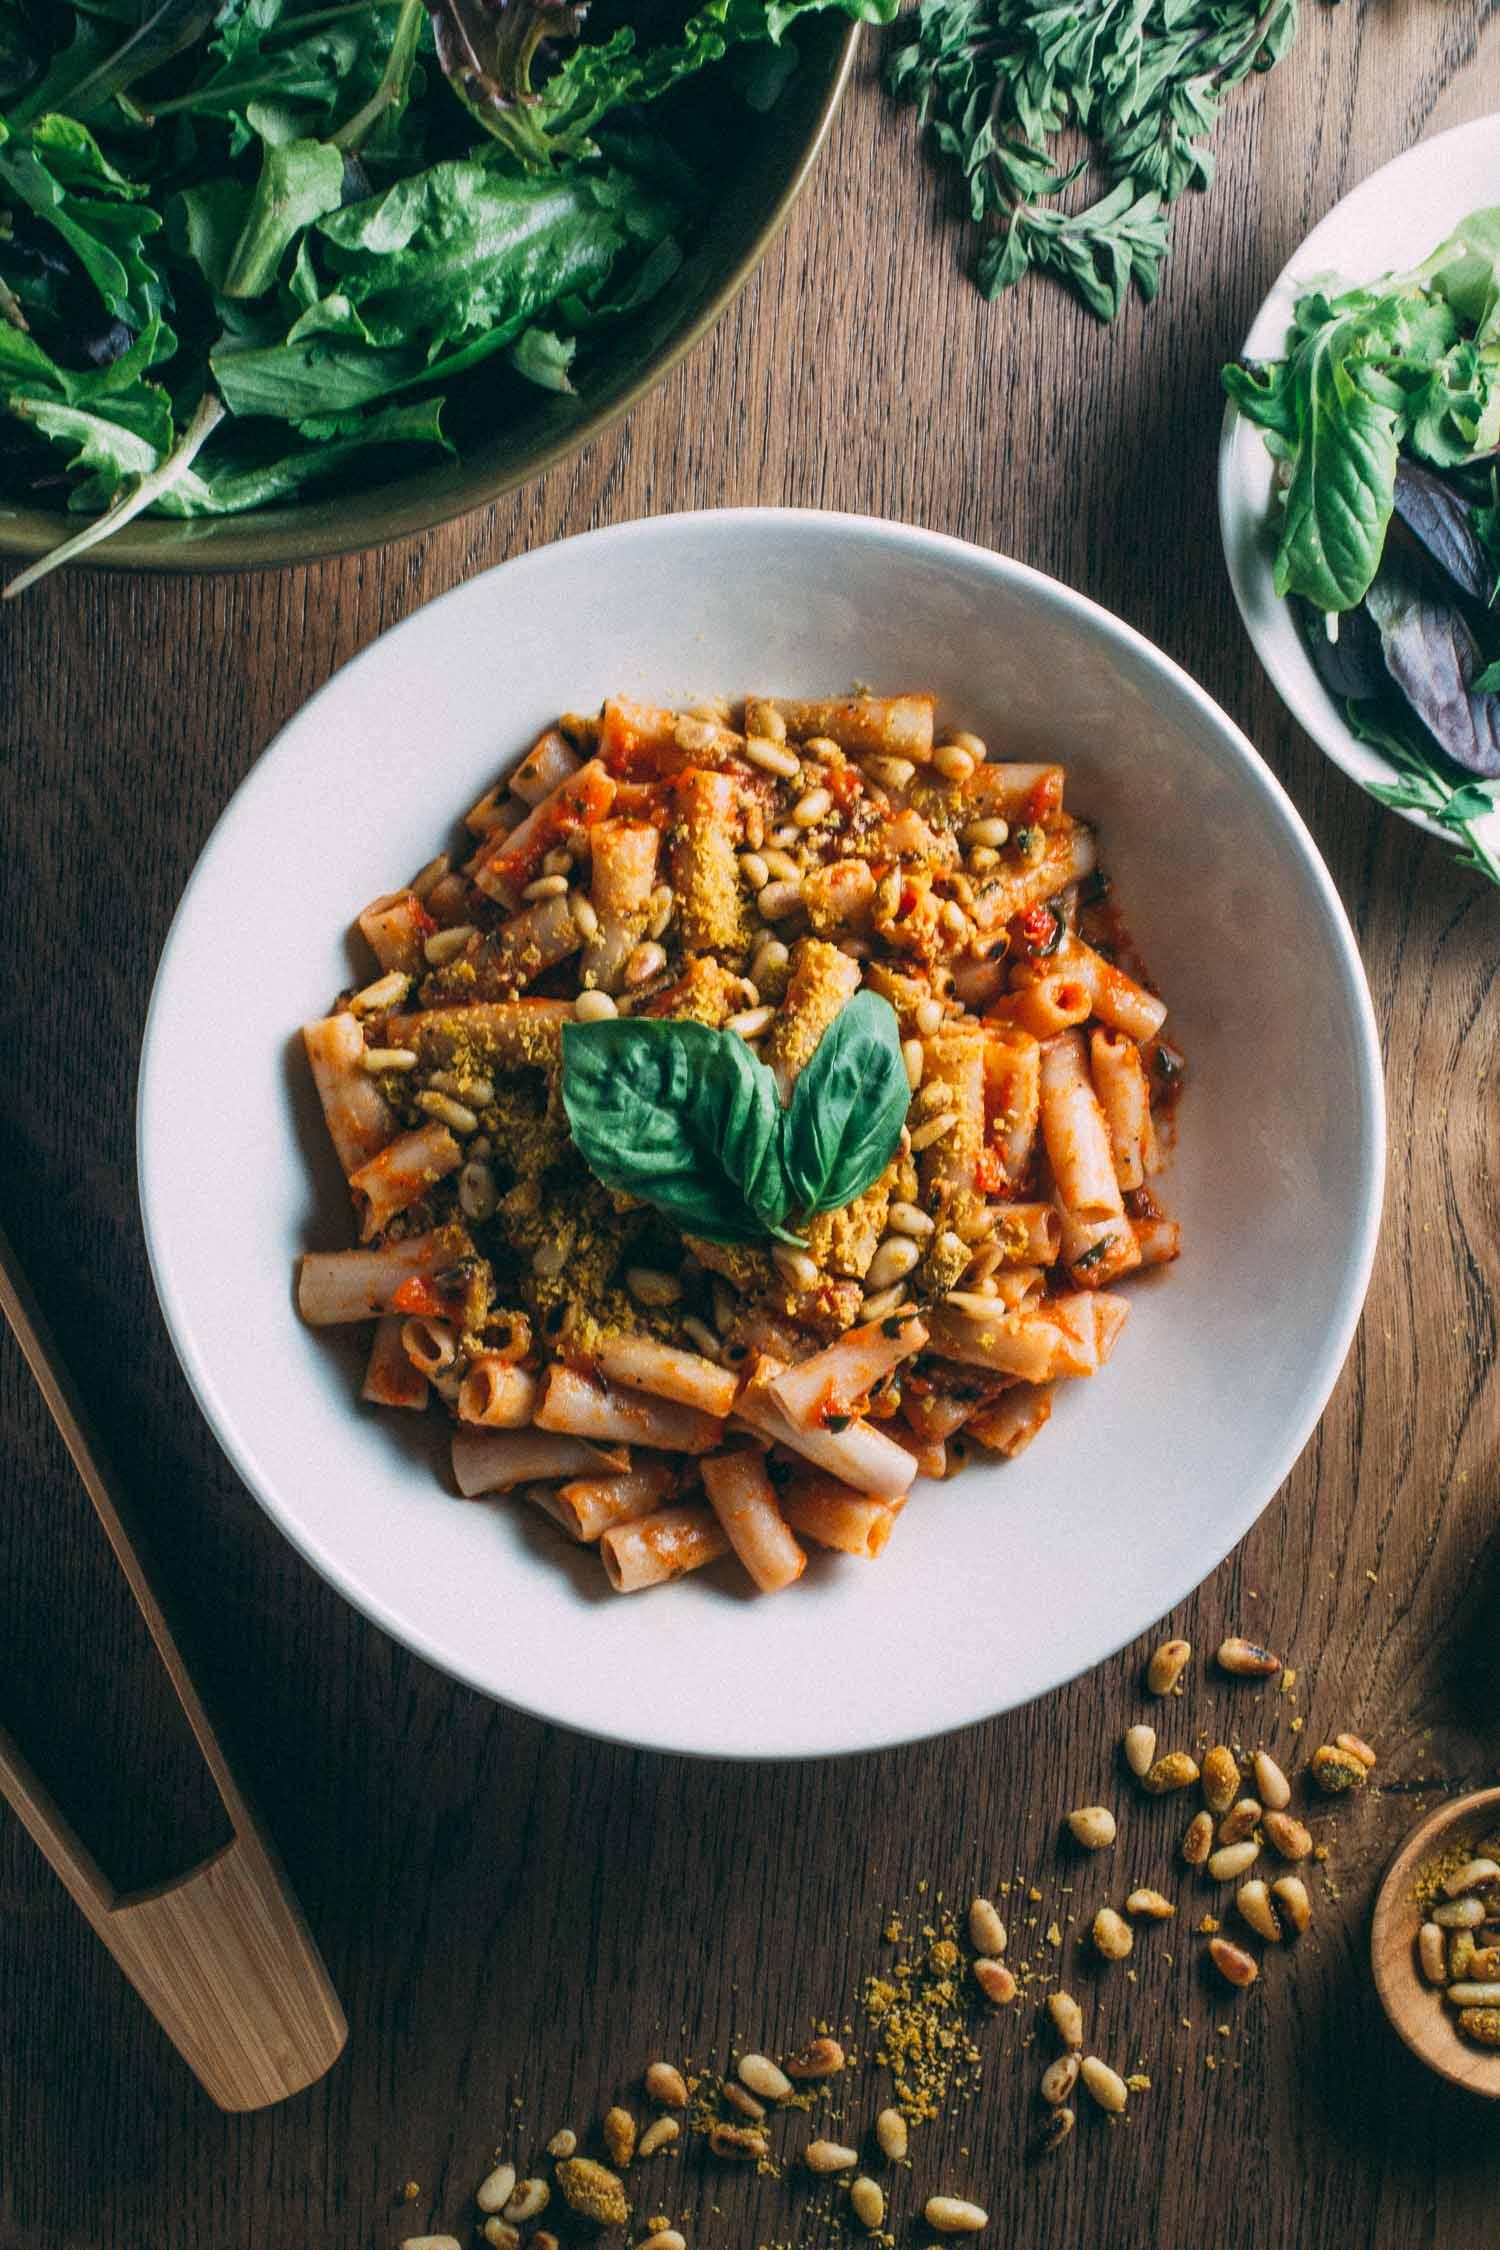 Sun-Dried Tomato Best-o Pesto Pasta #vegan #plant-based #plantbased #diet